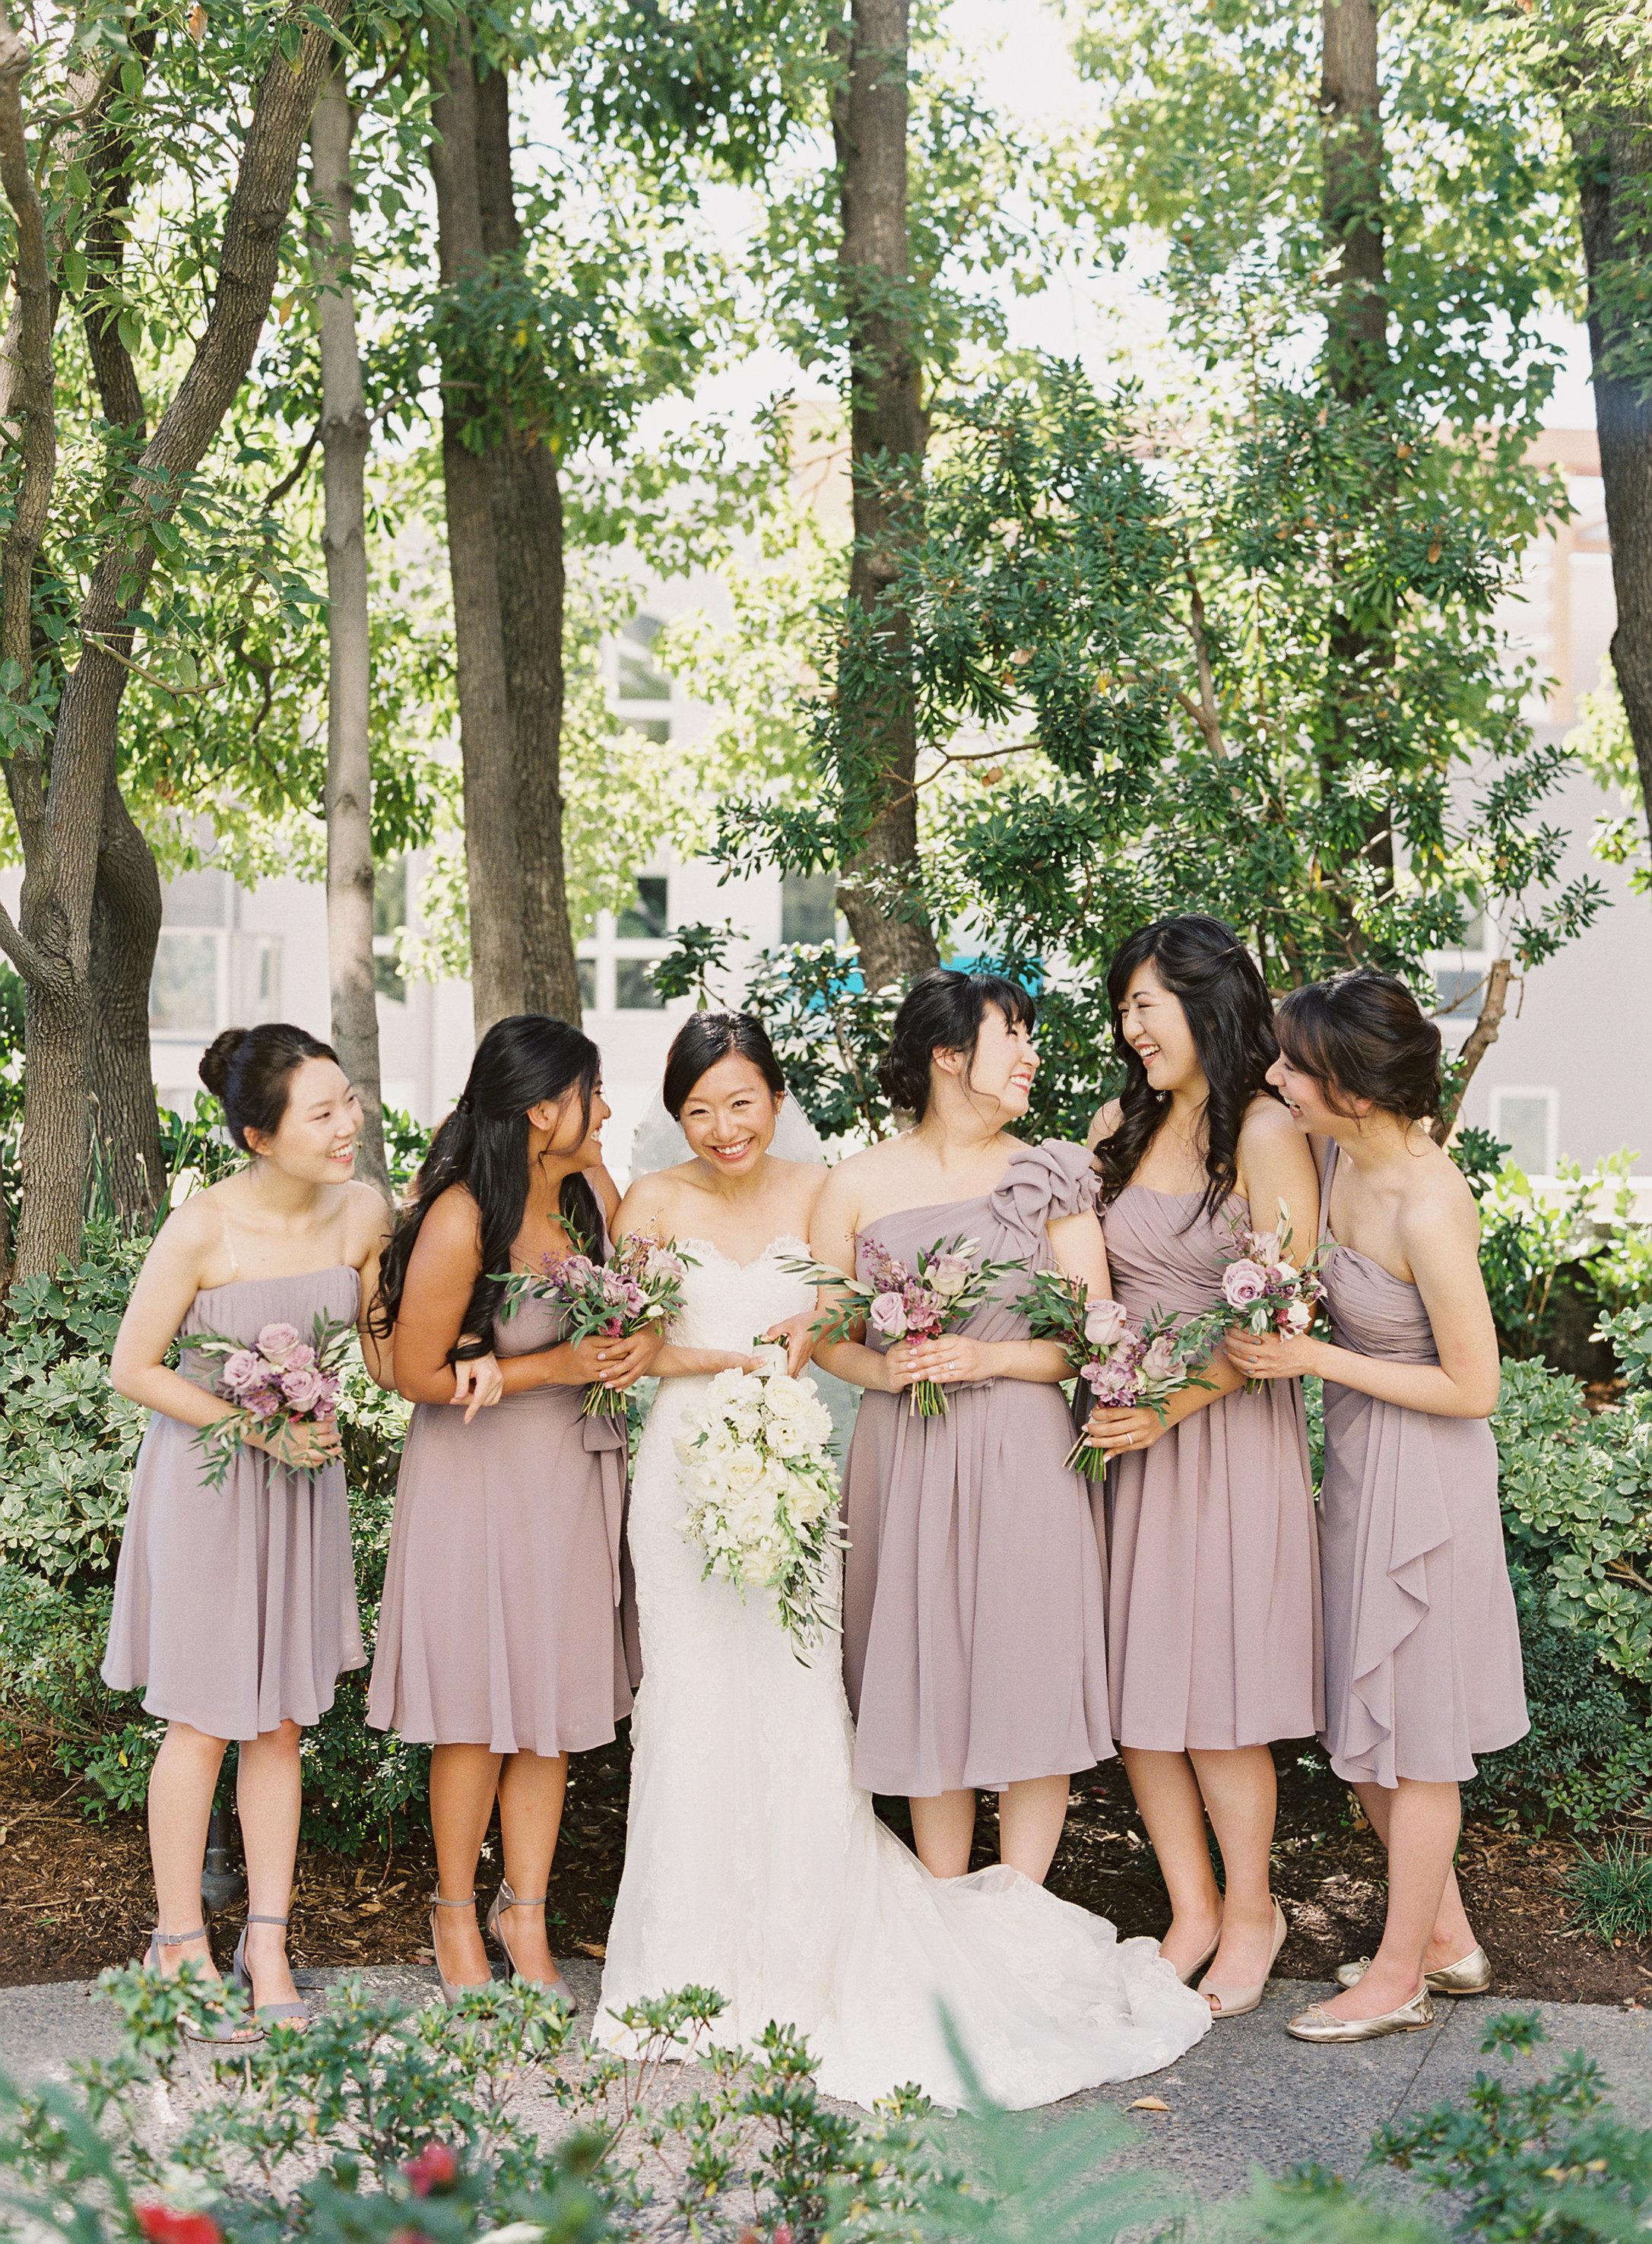 Wedding_Party_012.jpg